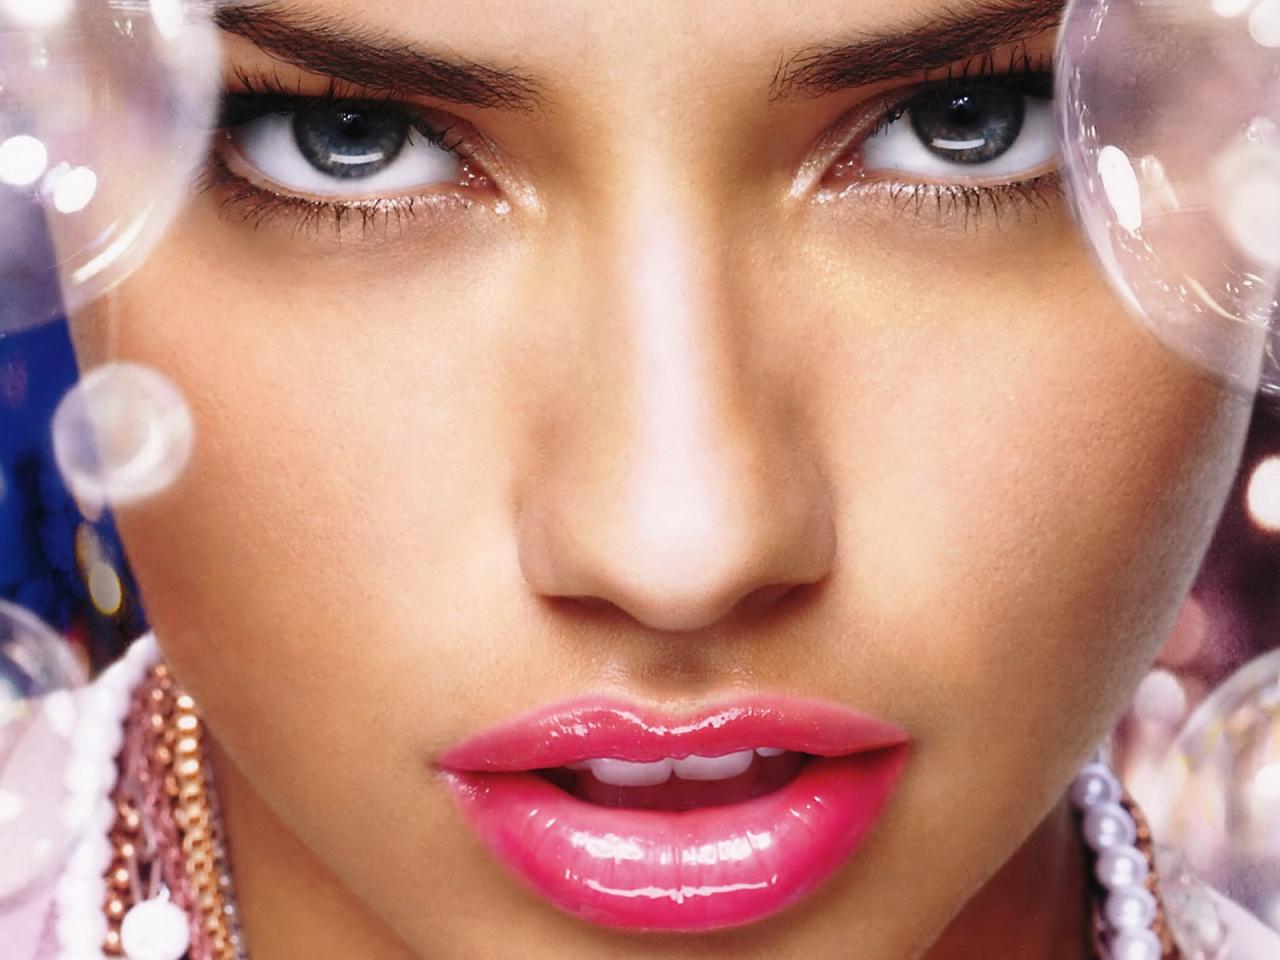 Adriana Lima Pretty Lips Wallpapers